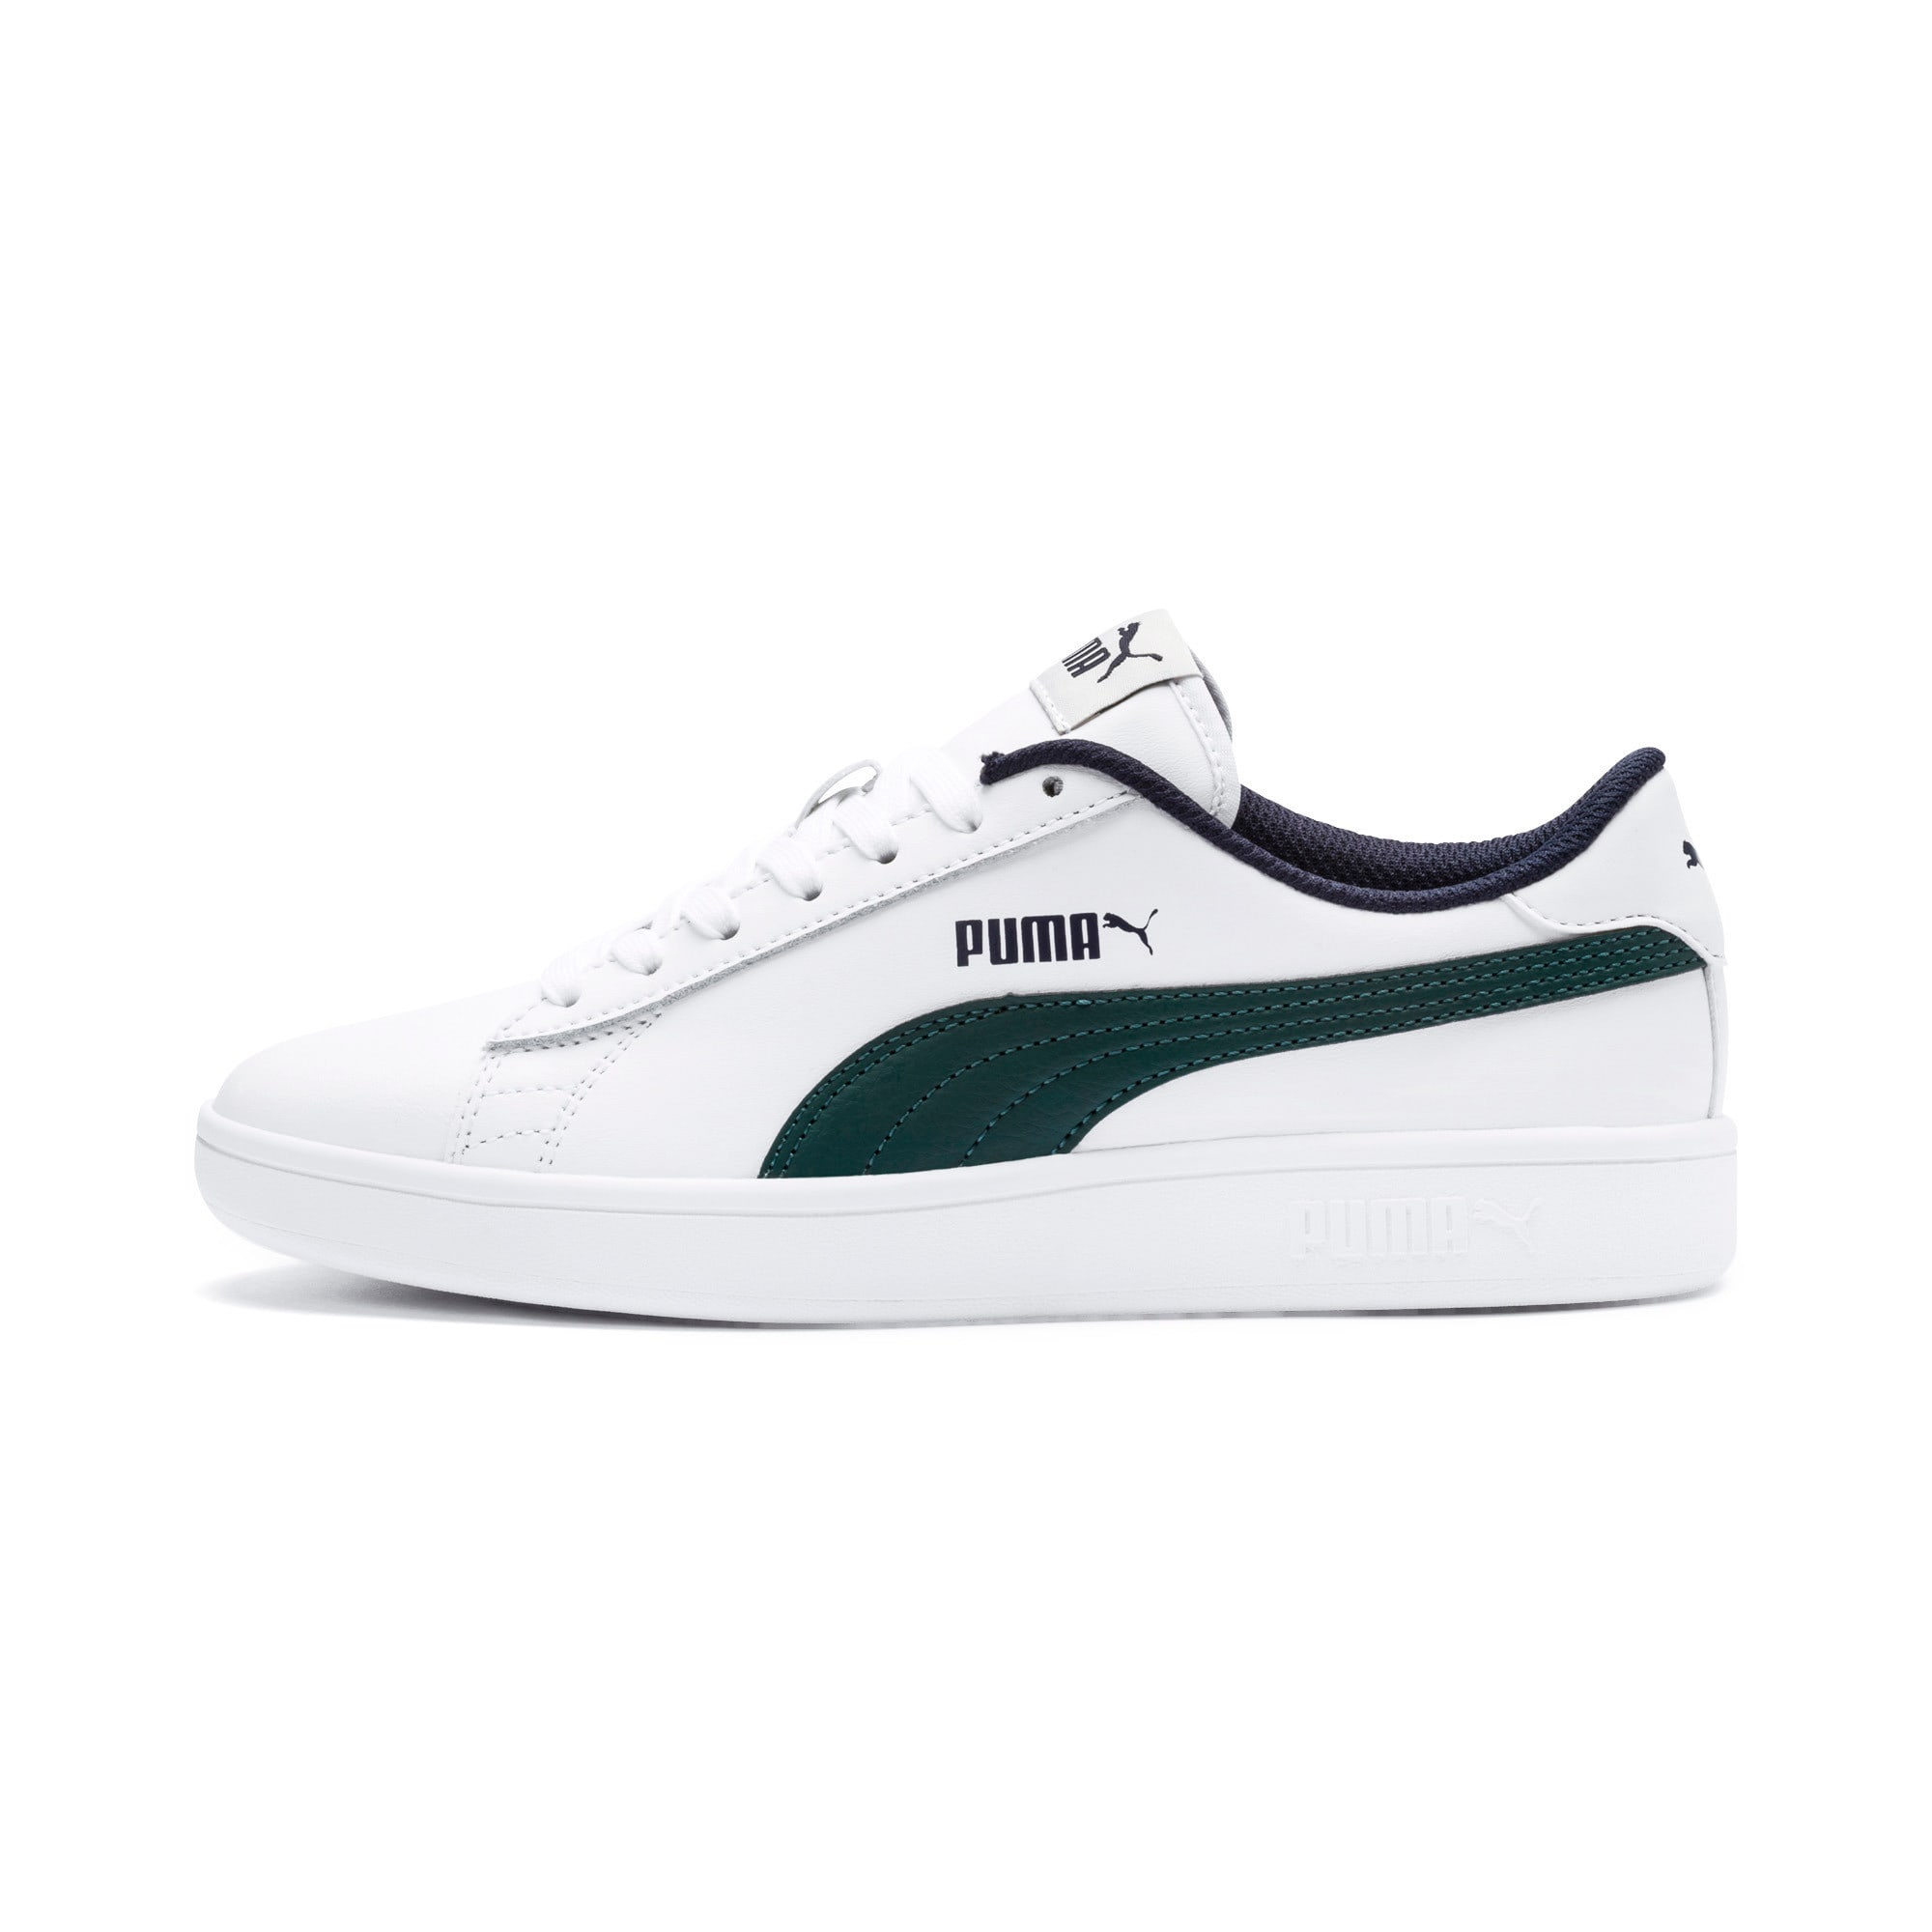 Thumbnail 1 of PUMA Smash v2 Youth Sneaker, Puma White-Ponderosa Pine, medium